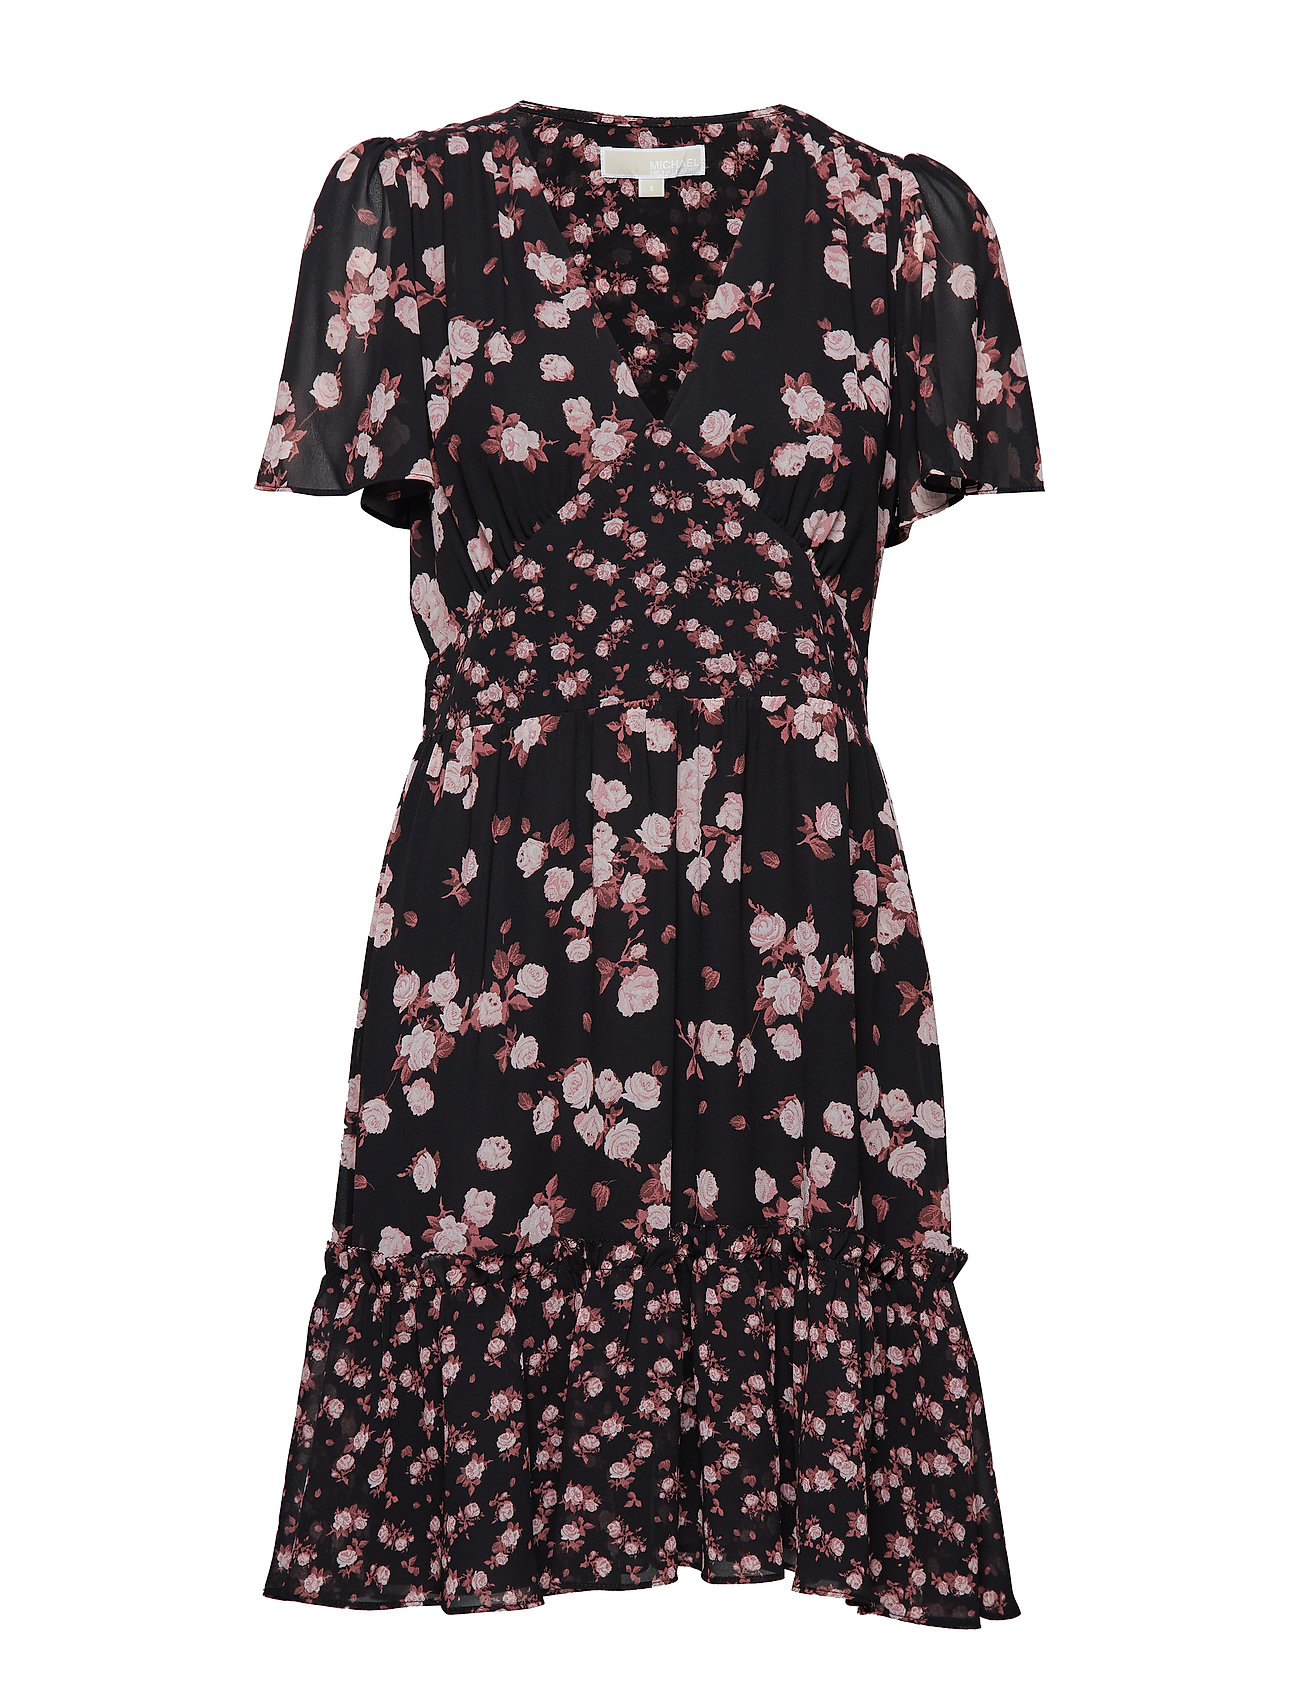 Michael Kors ROSE PRINT MIX DRESS - BLK/DSTYROSE